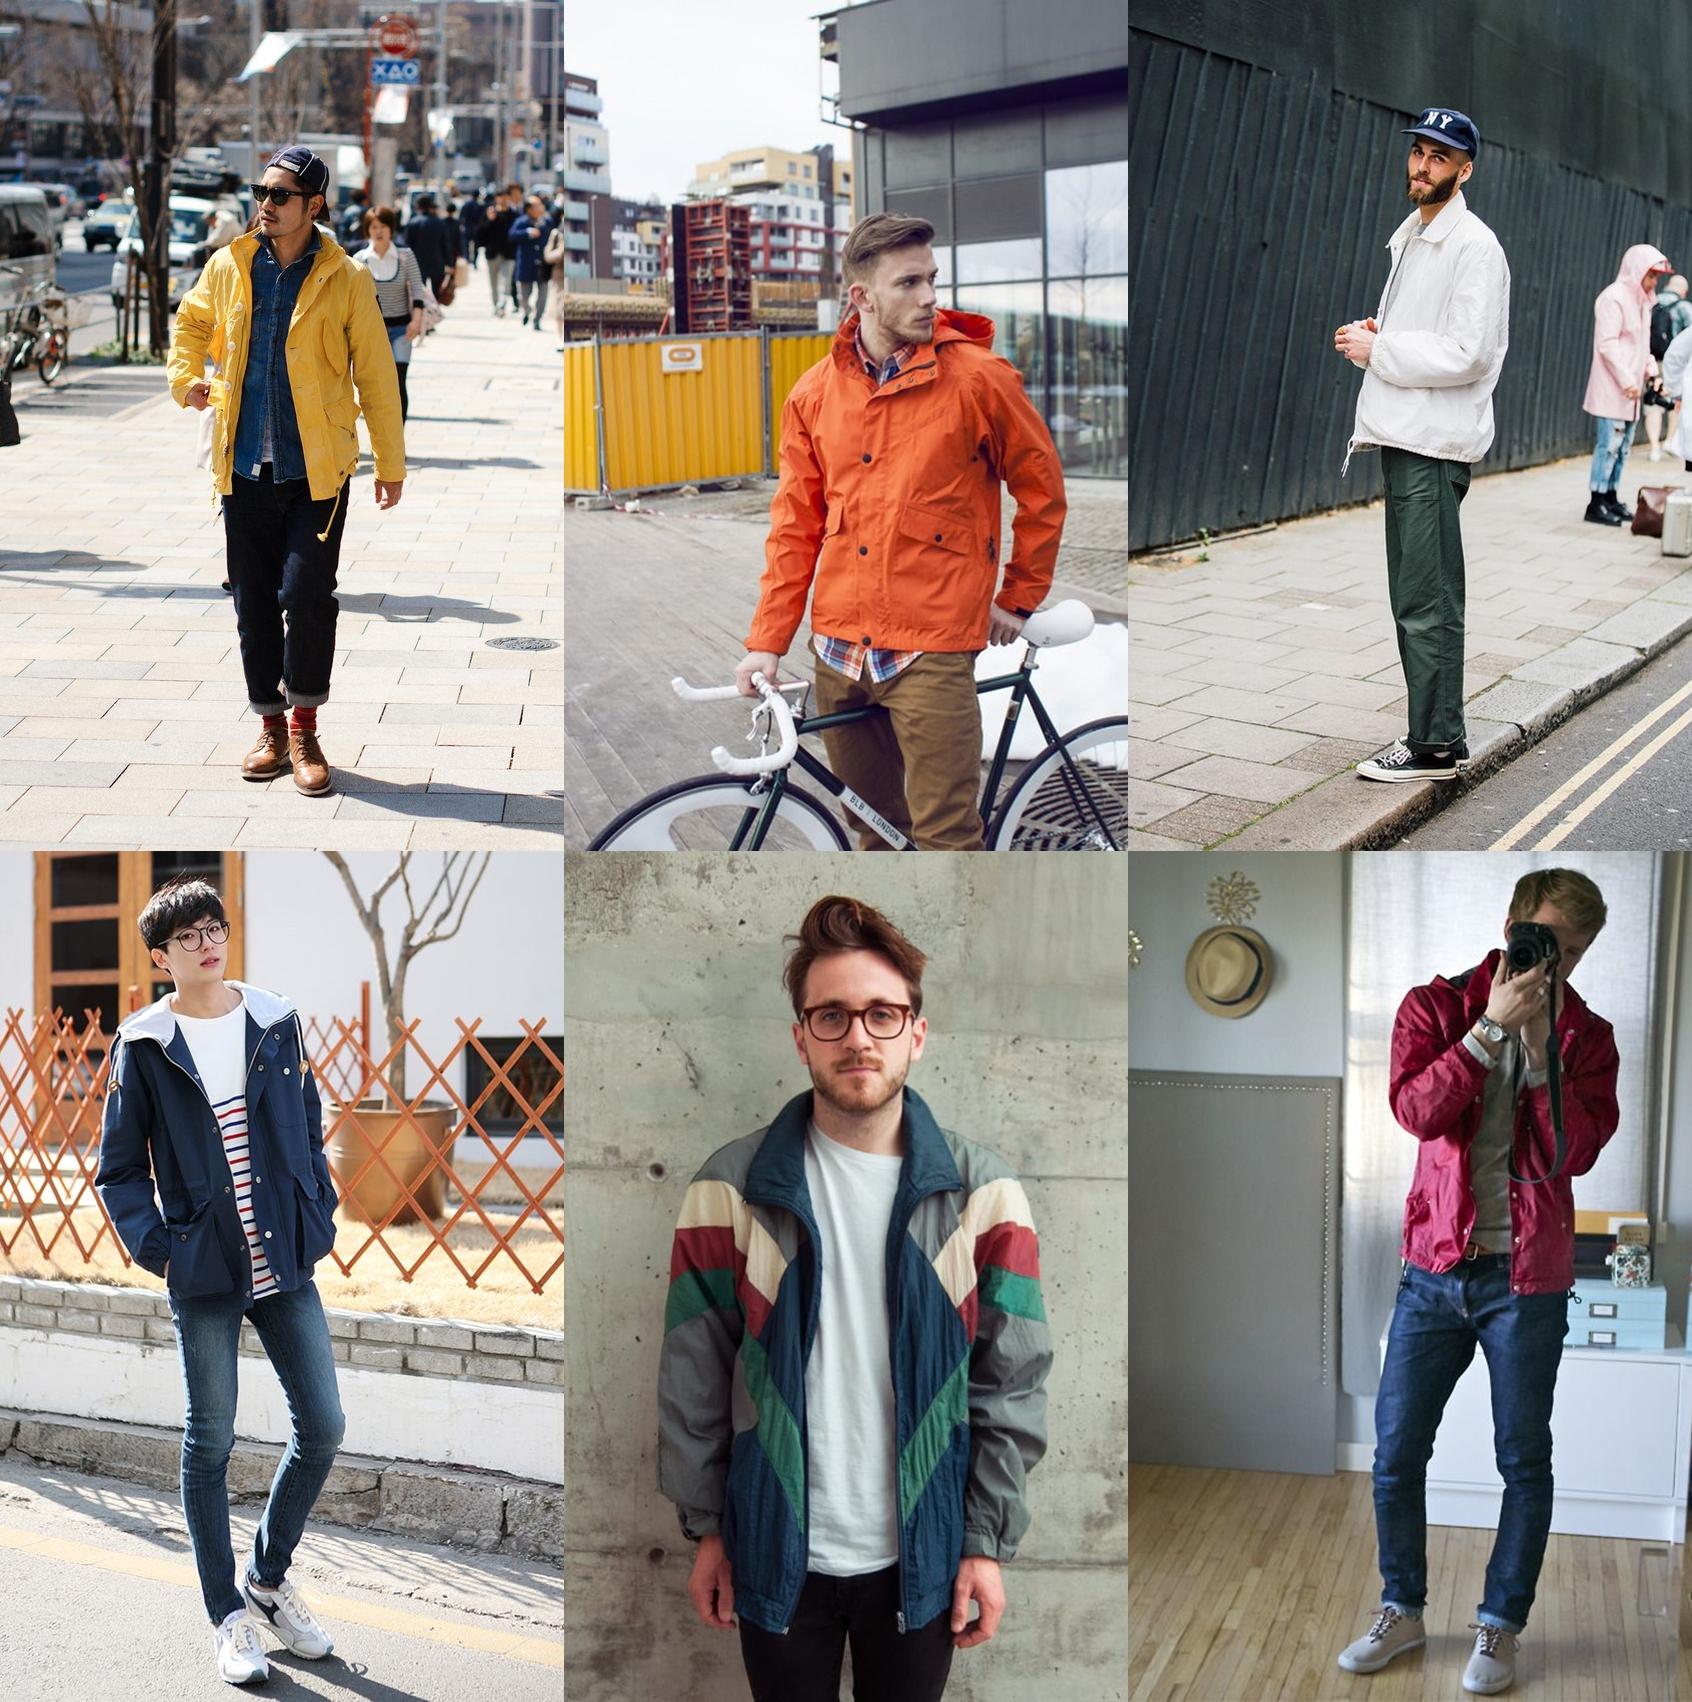 jaqueta masculina, , jacket for men, tendencia de moda masculina 2017, look masculino 2017, estilo masculino, blog de moda masculina, moda sem censura, alex cursino, 6